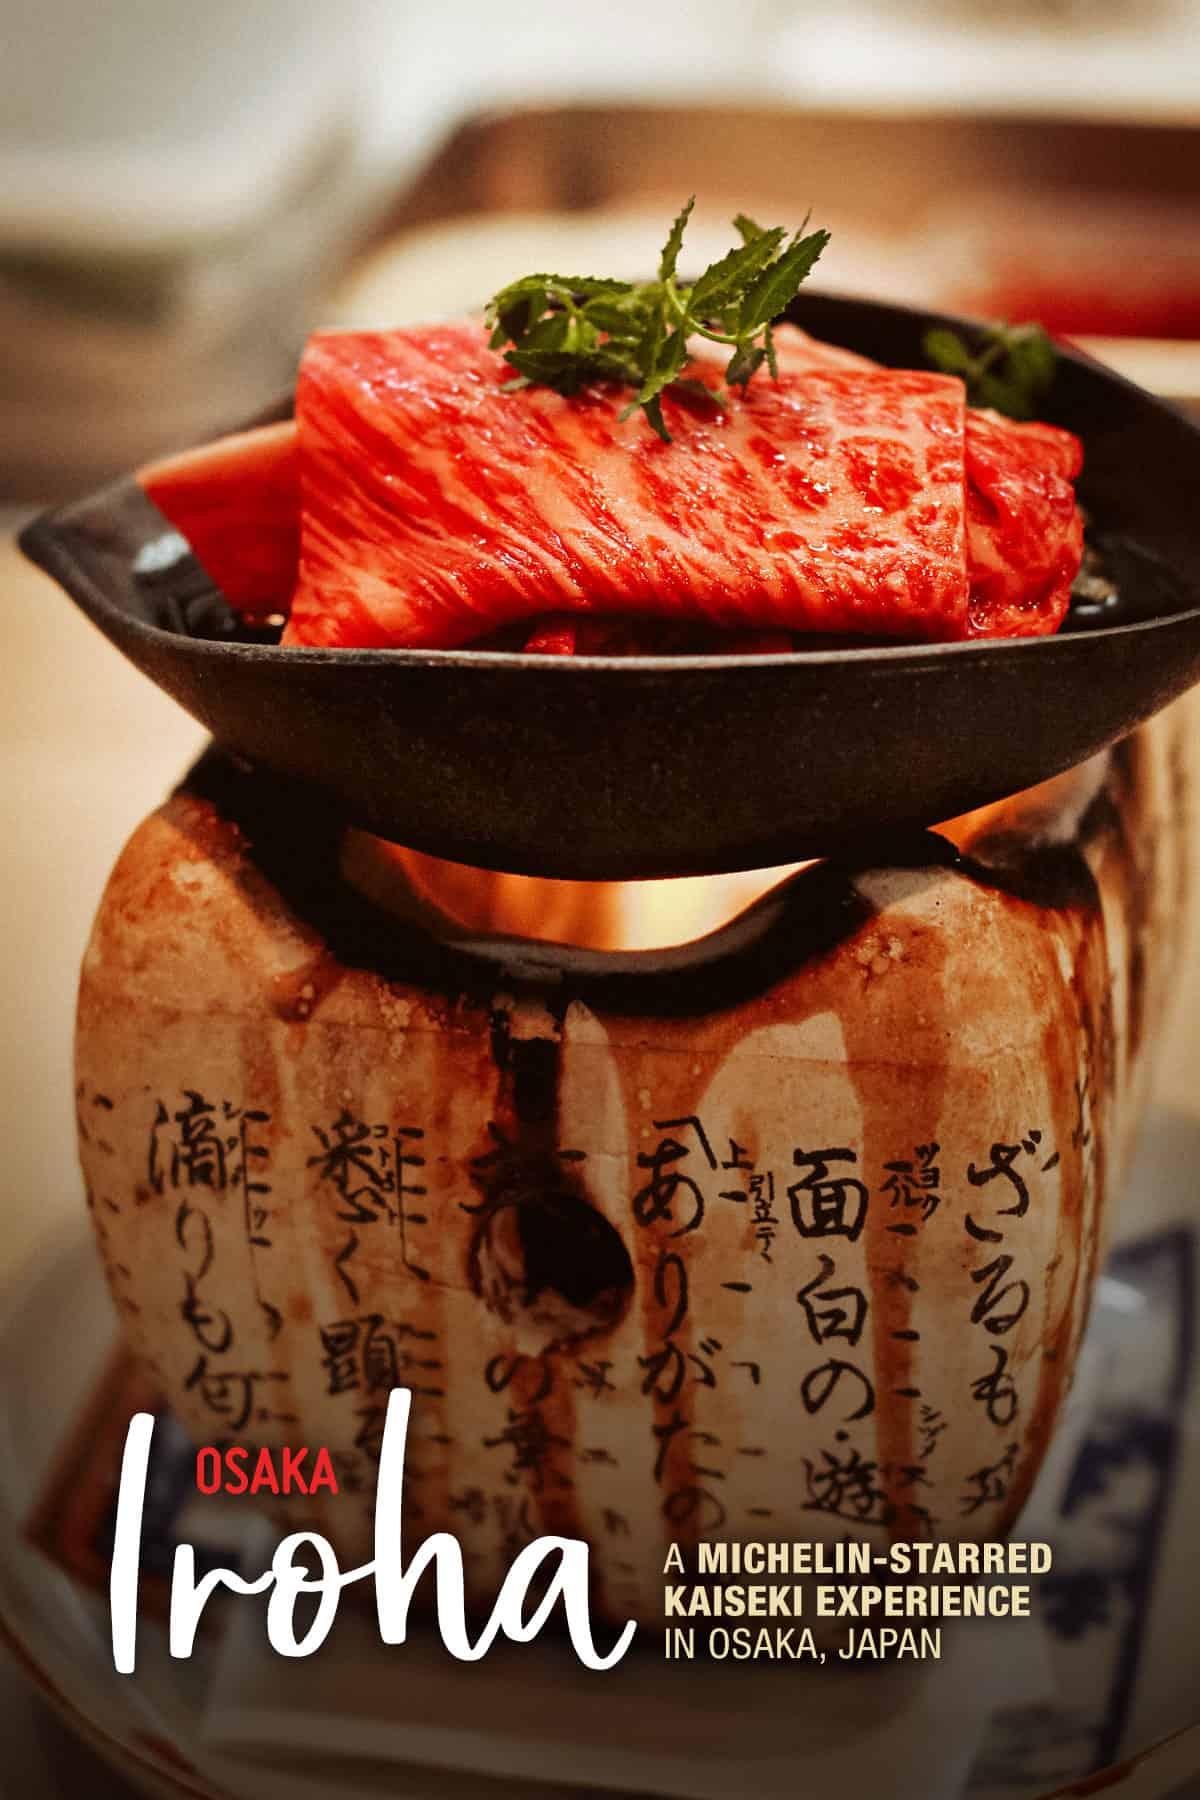 Saga beef at Iroha, Osaka, Japan